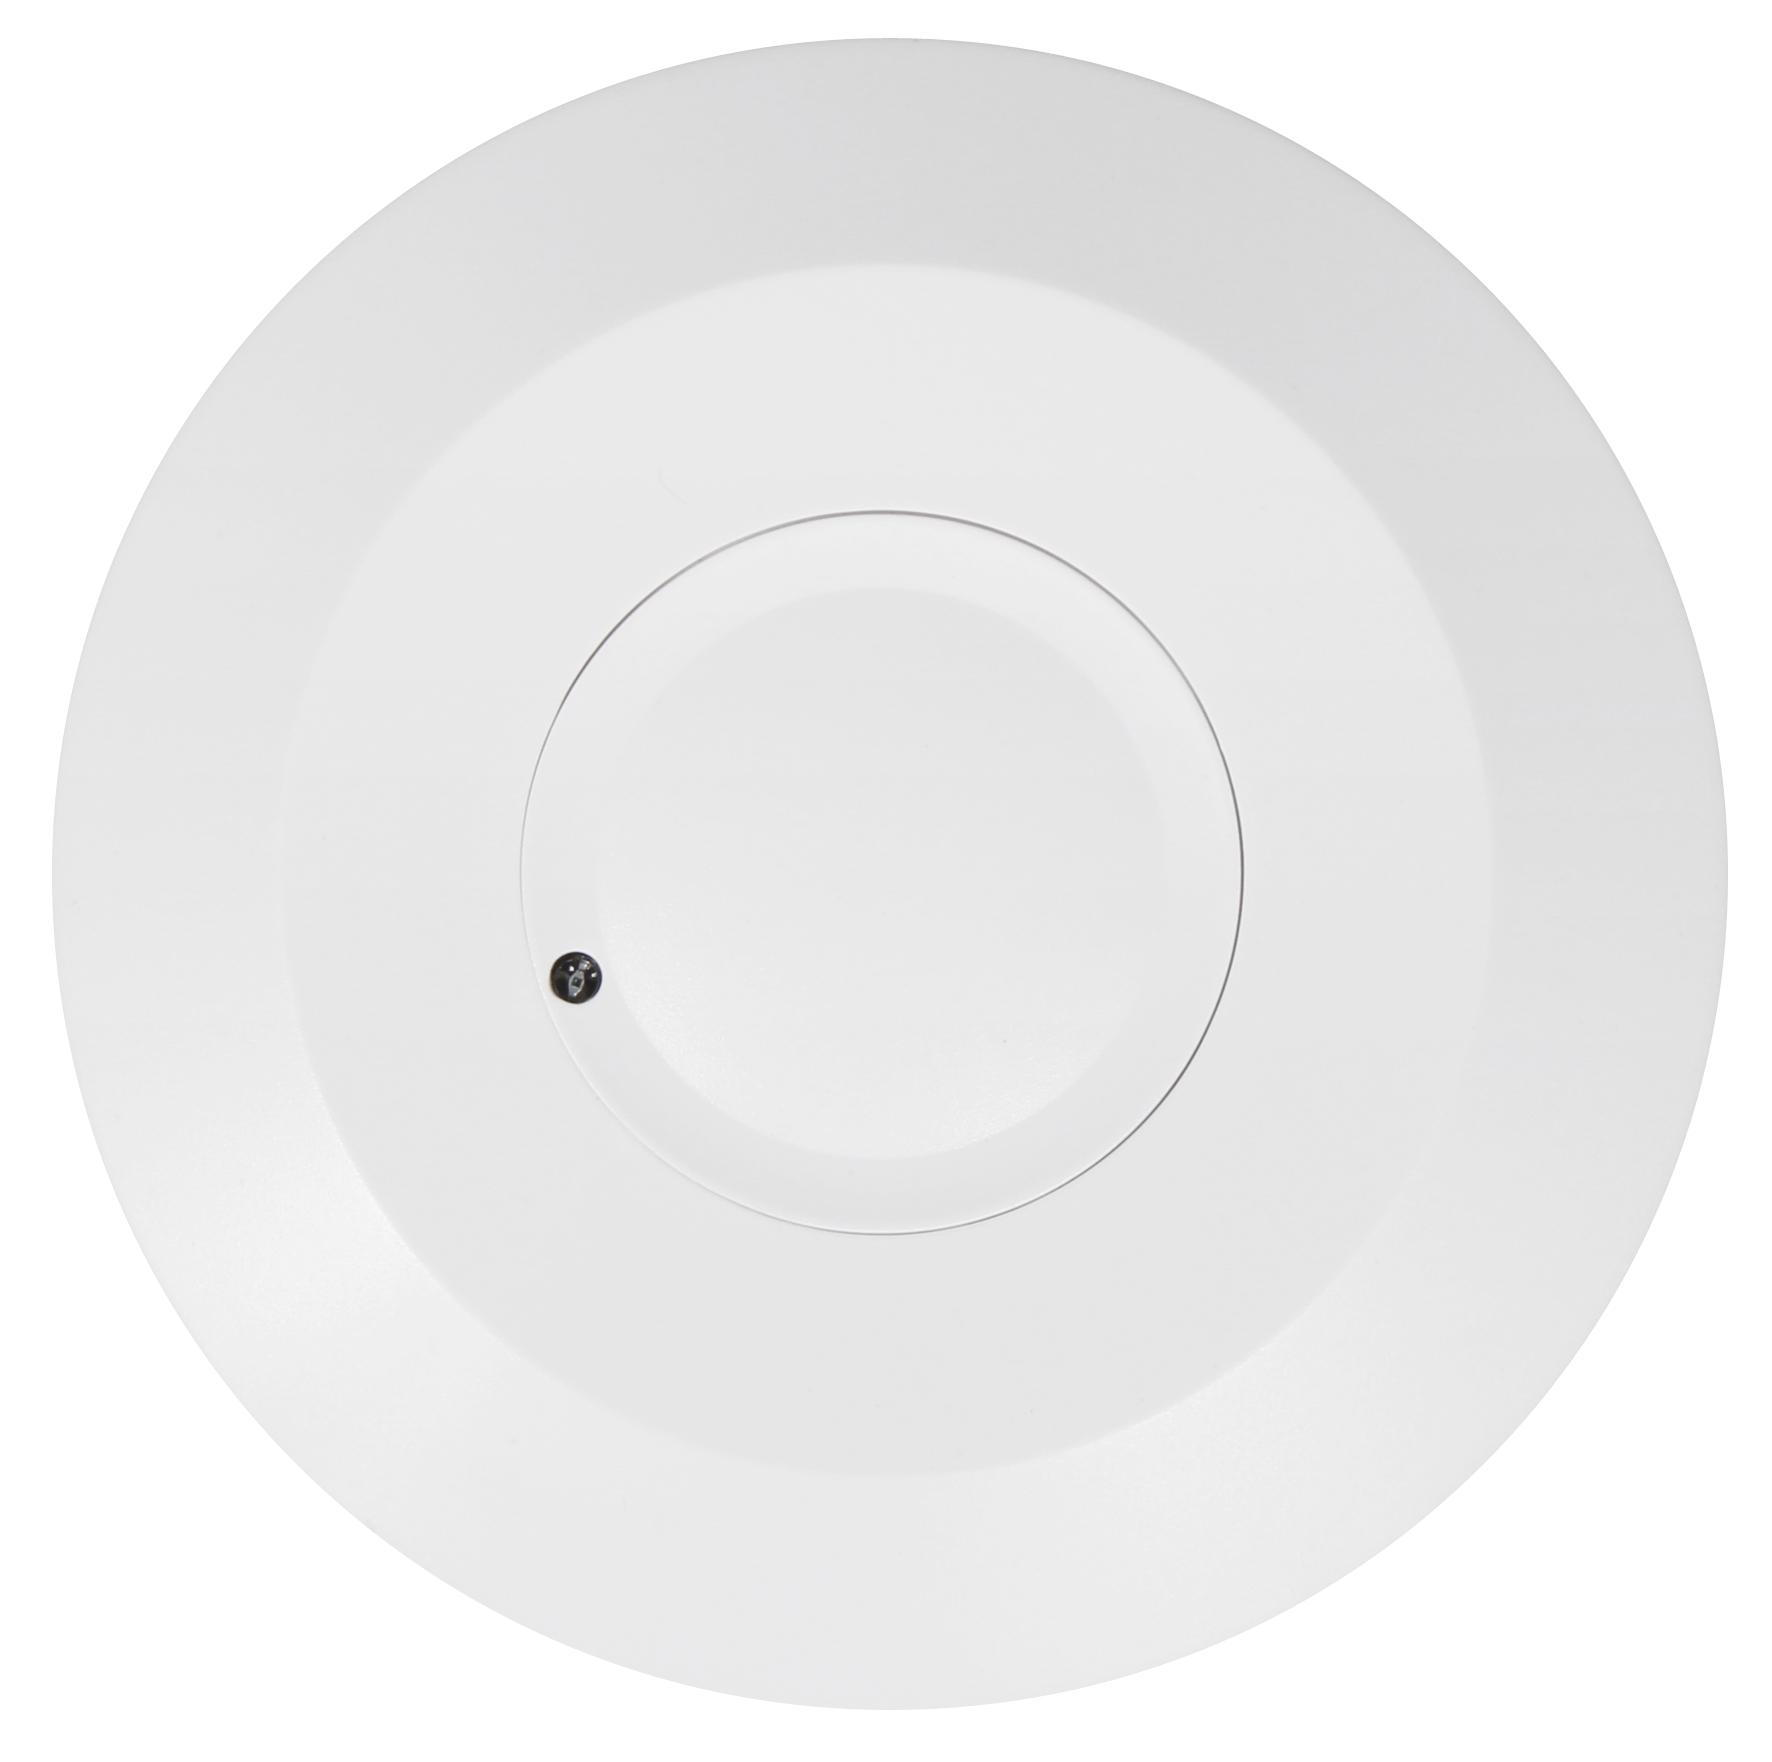 HF / Mikrowellen-Bewegungsmelder McShine ''LX-700'', 360°, 230V / 2.000W, weiß, LED geeignet